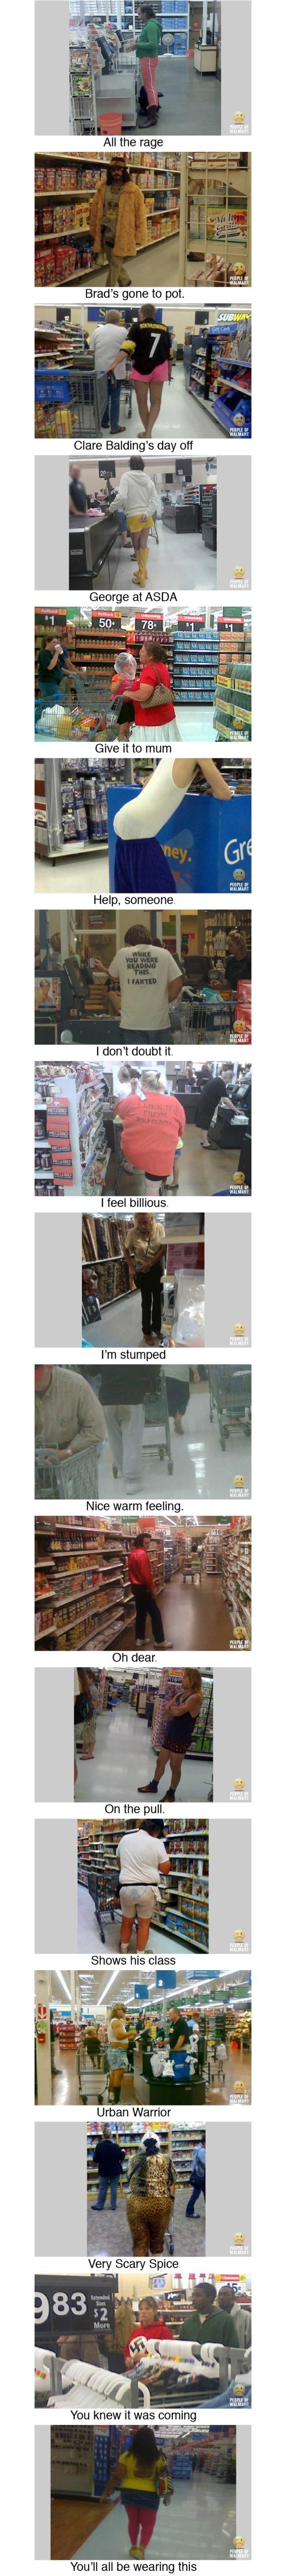 Walmartpeople